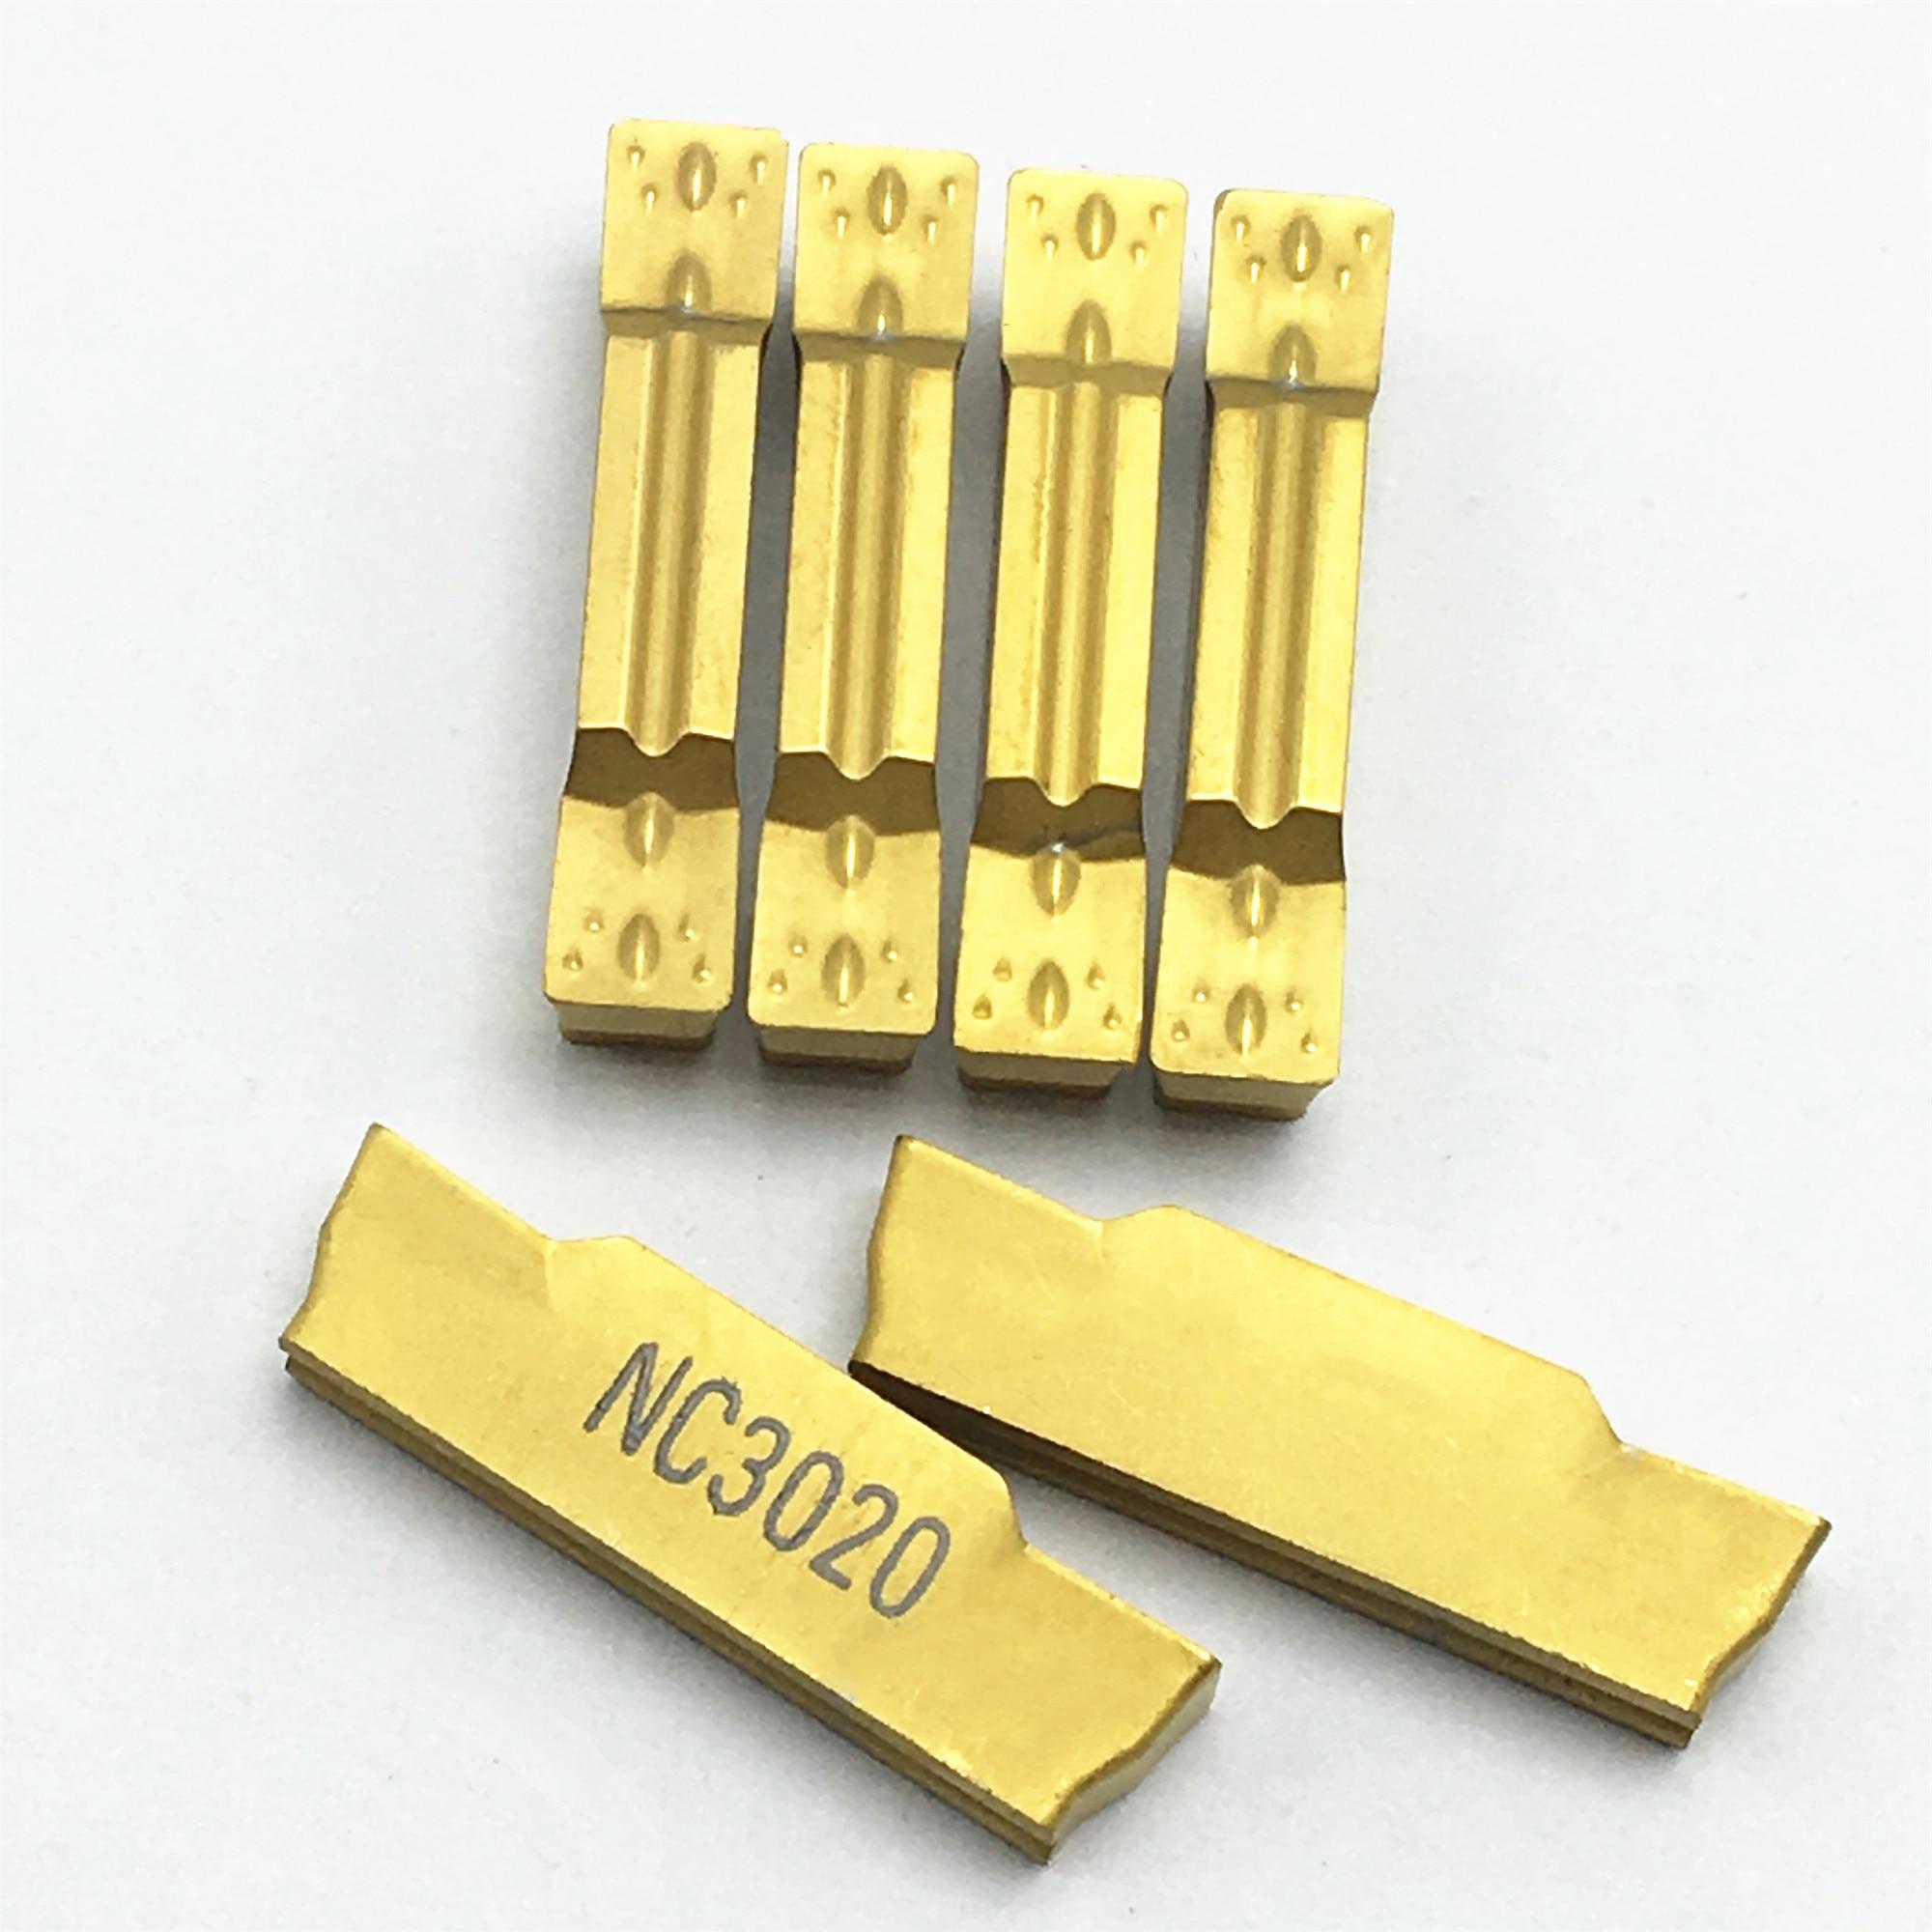 10pcs SP400 NC3020 GTN-4 Grooving Cut-Off Carbide Inserts 4mm Width For CNC Tool